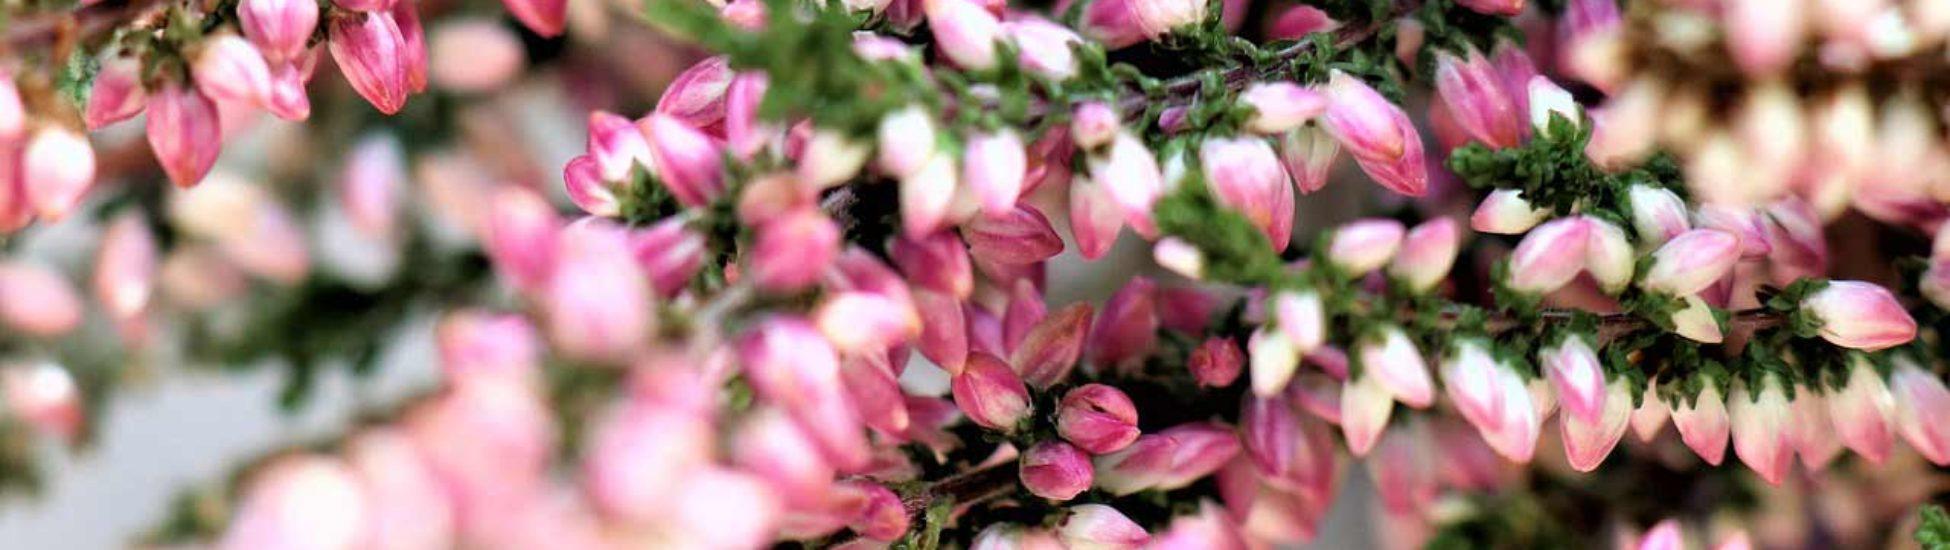 brezo-miniatura